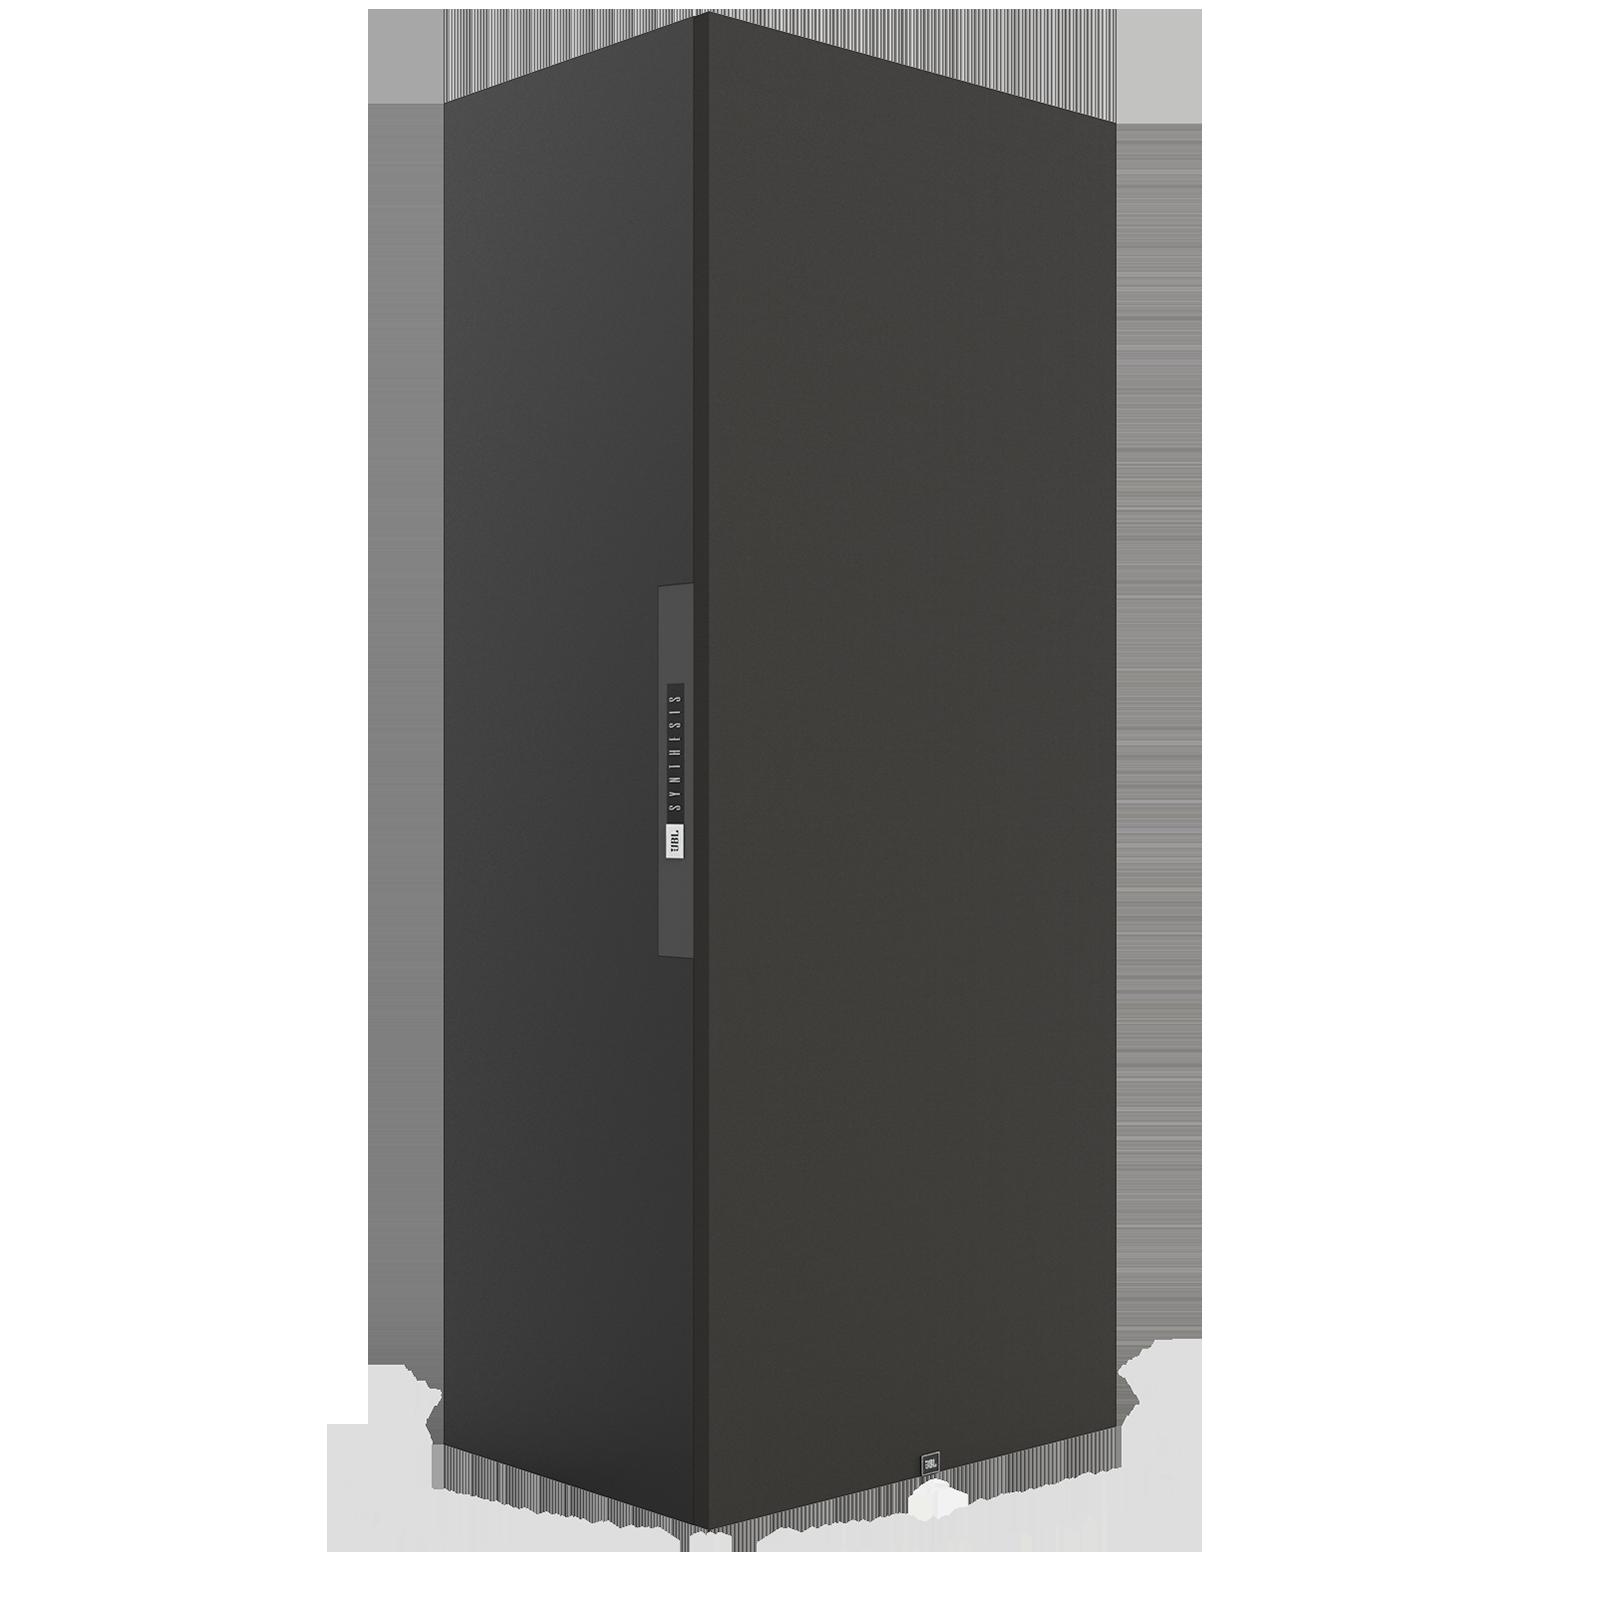 SCL-1 - Black - 2-Way Dual 12-inch (300mm) Custom LCR Loudspeaker - Detailshot 1